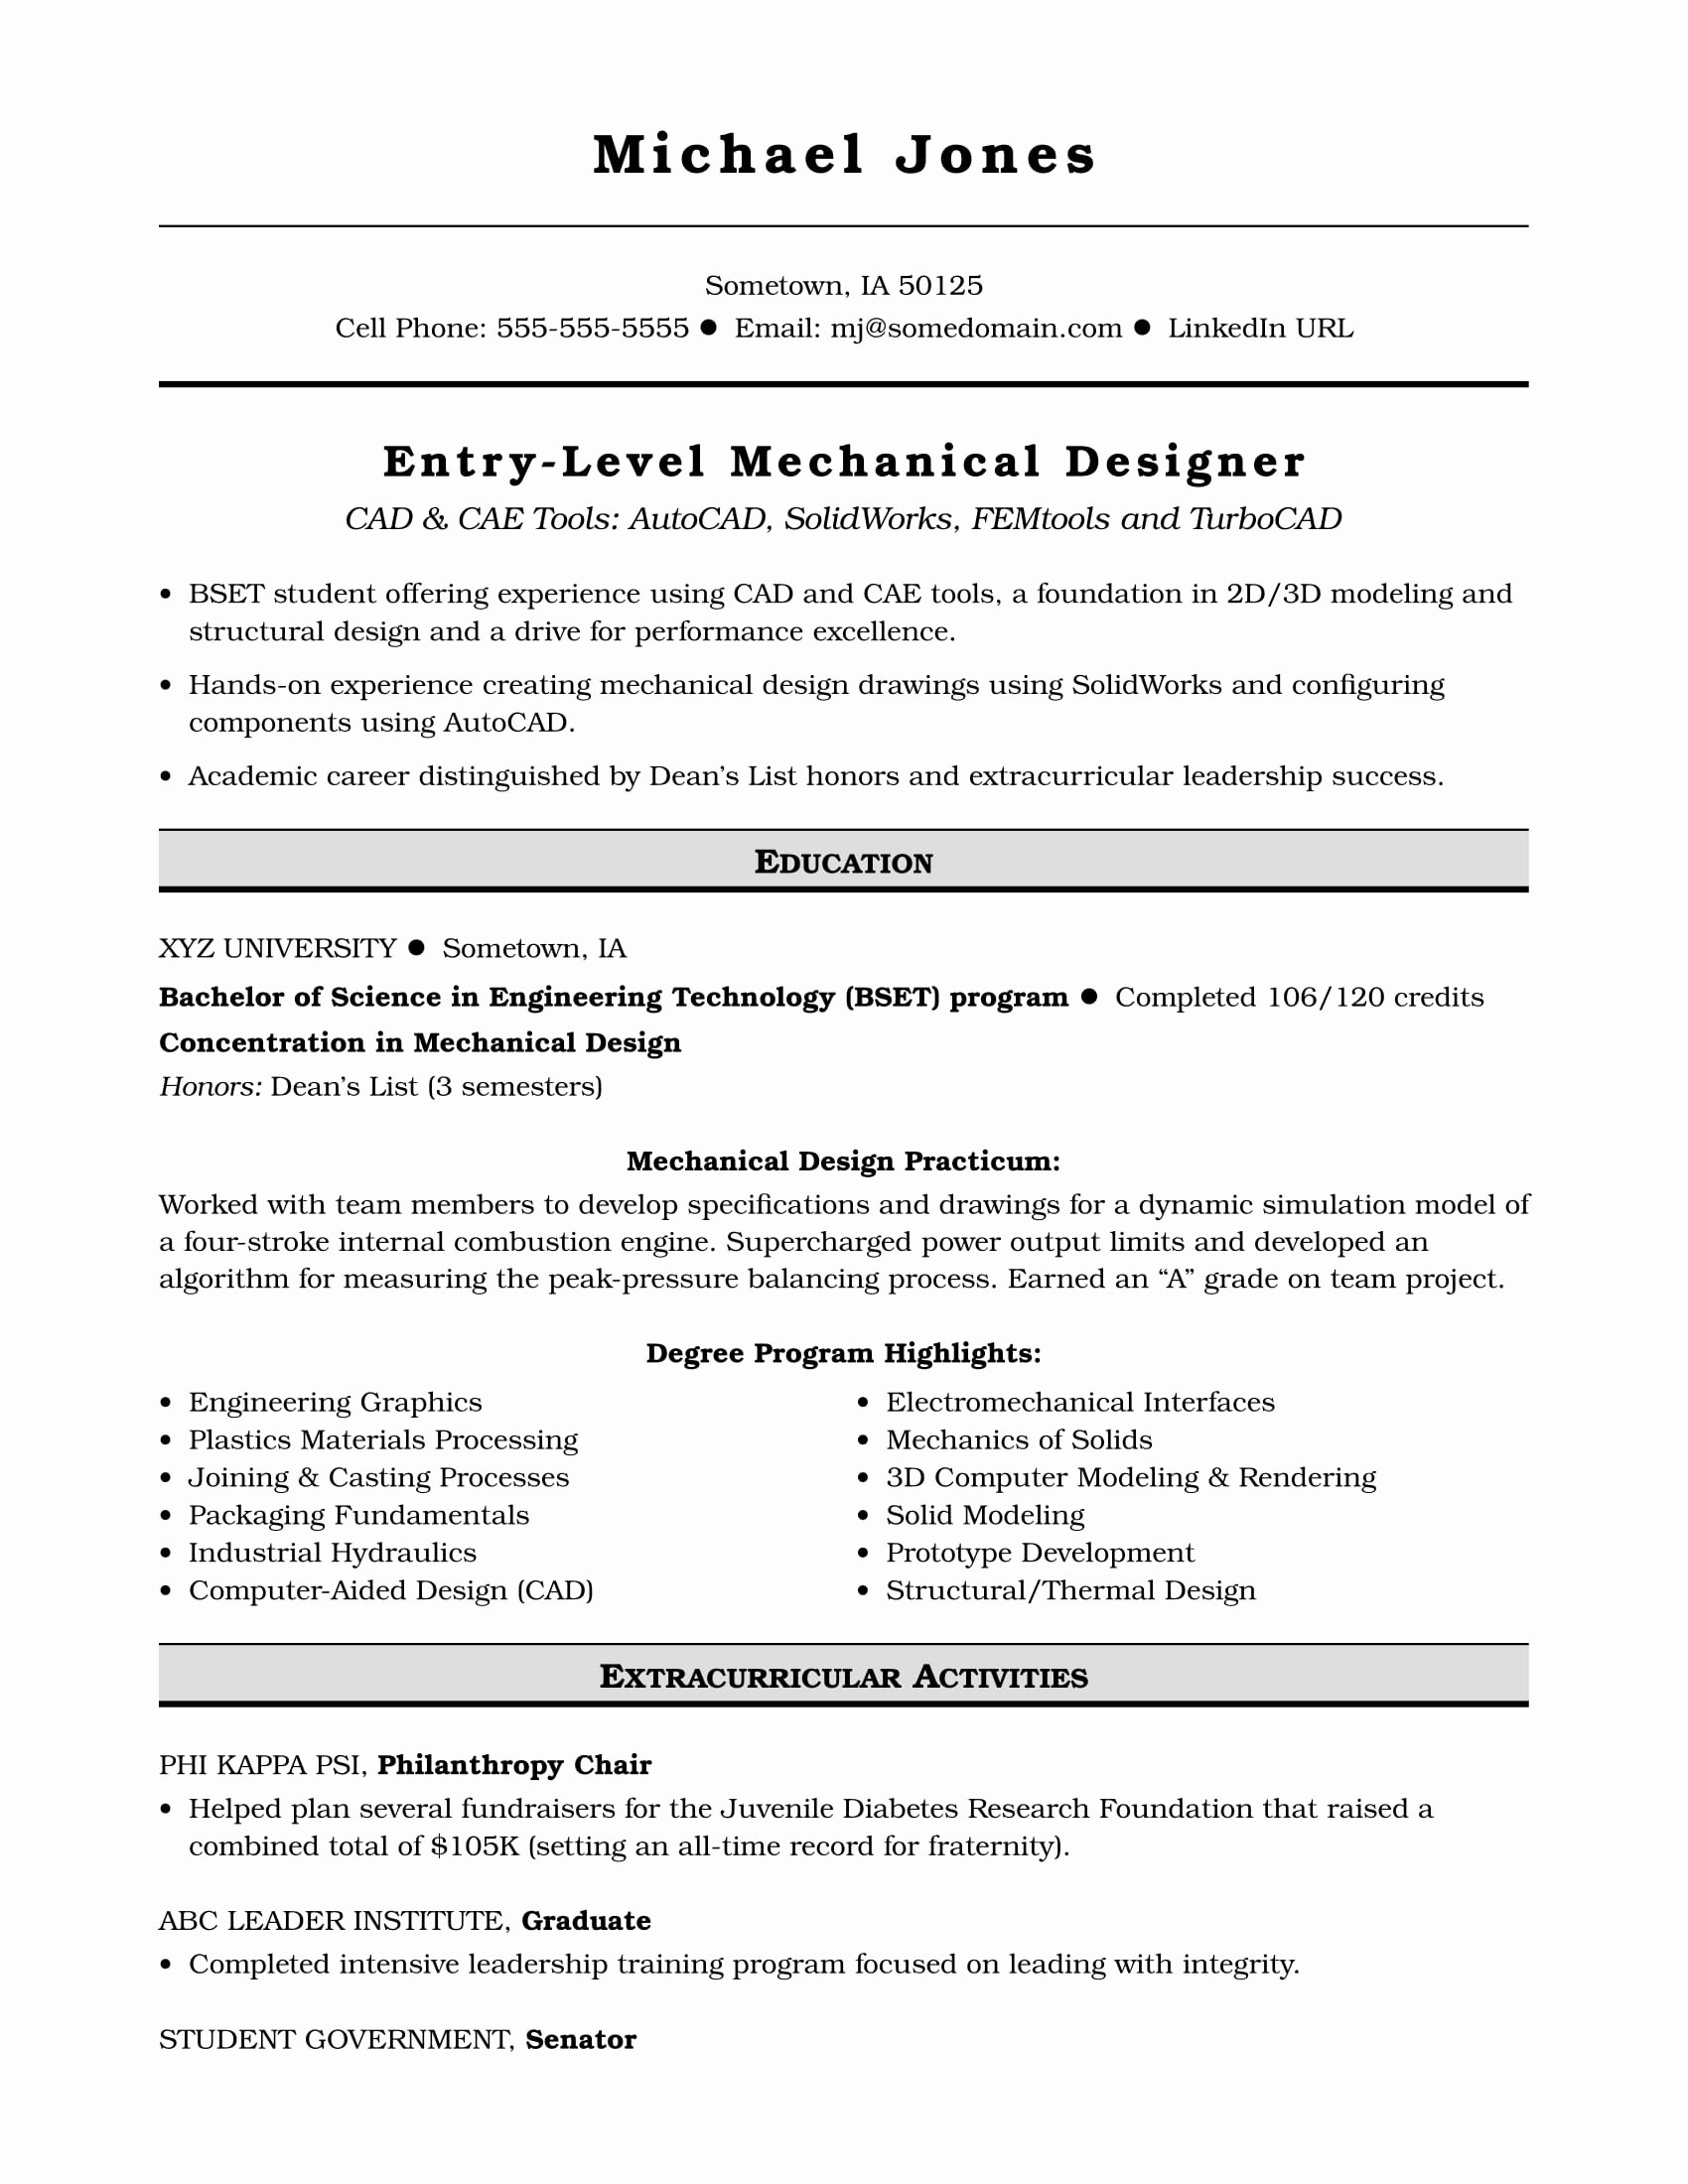 Entry Level Mechanical Engineering Resume Beautiful Sample Resume for An Entry Level Mechanical Designer